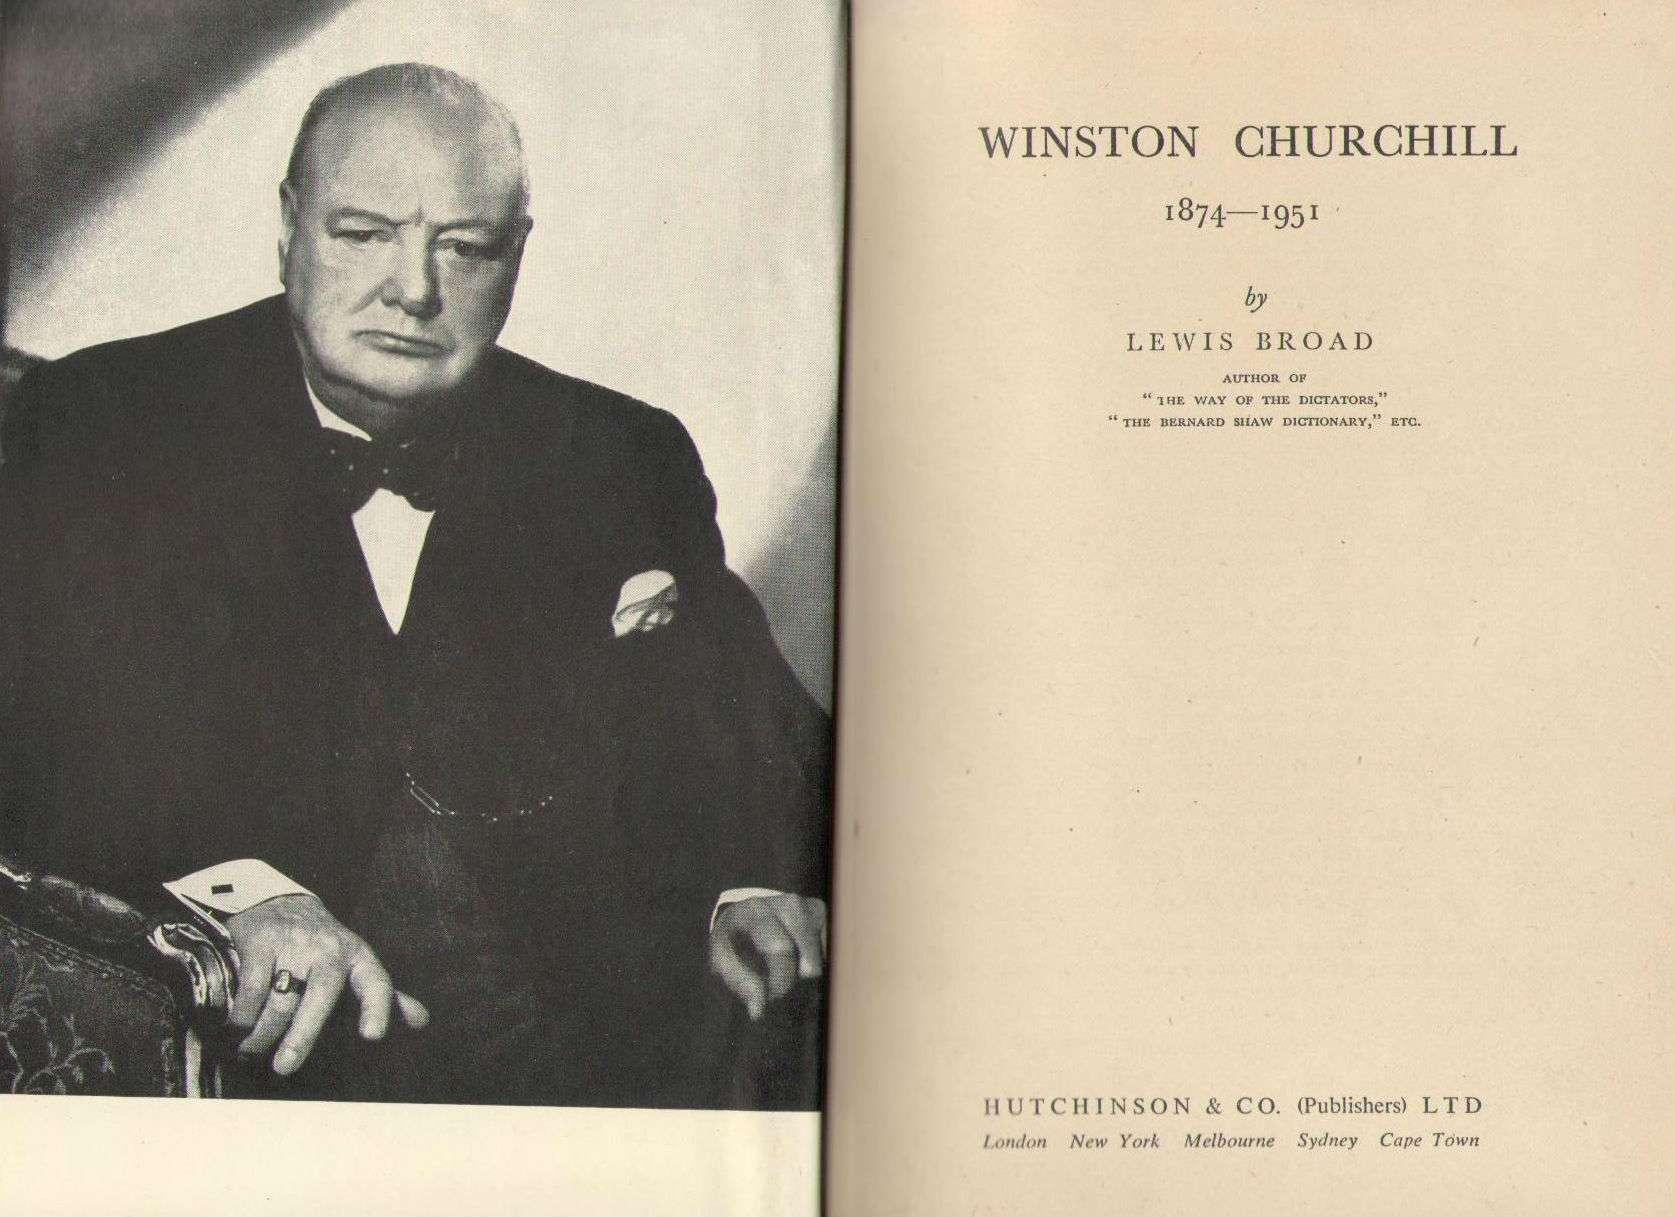 Winston Churchill 1874 - 1951